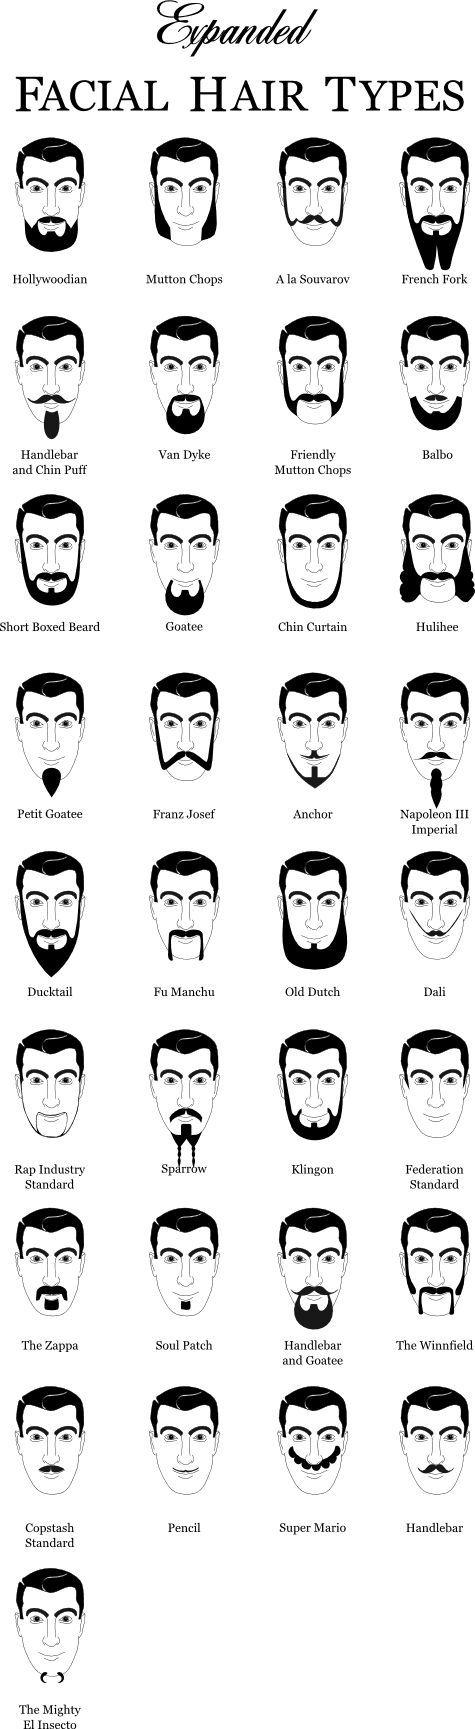 380 best hair hair hair ! images on pinterest | hairstyles, men's